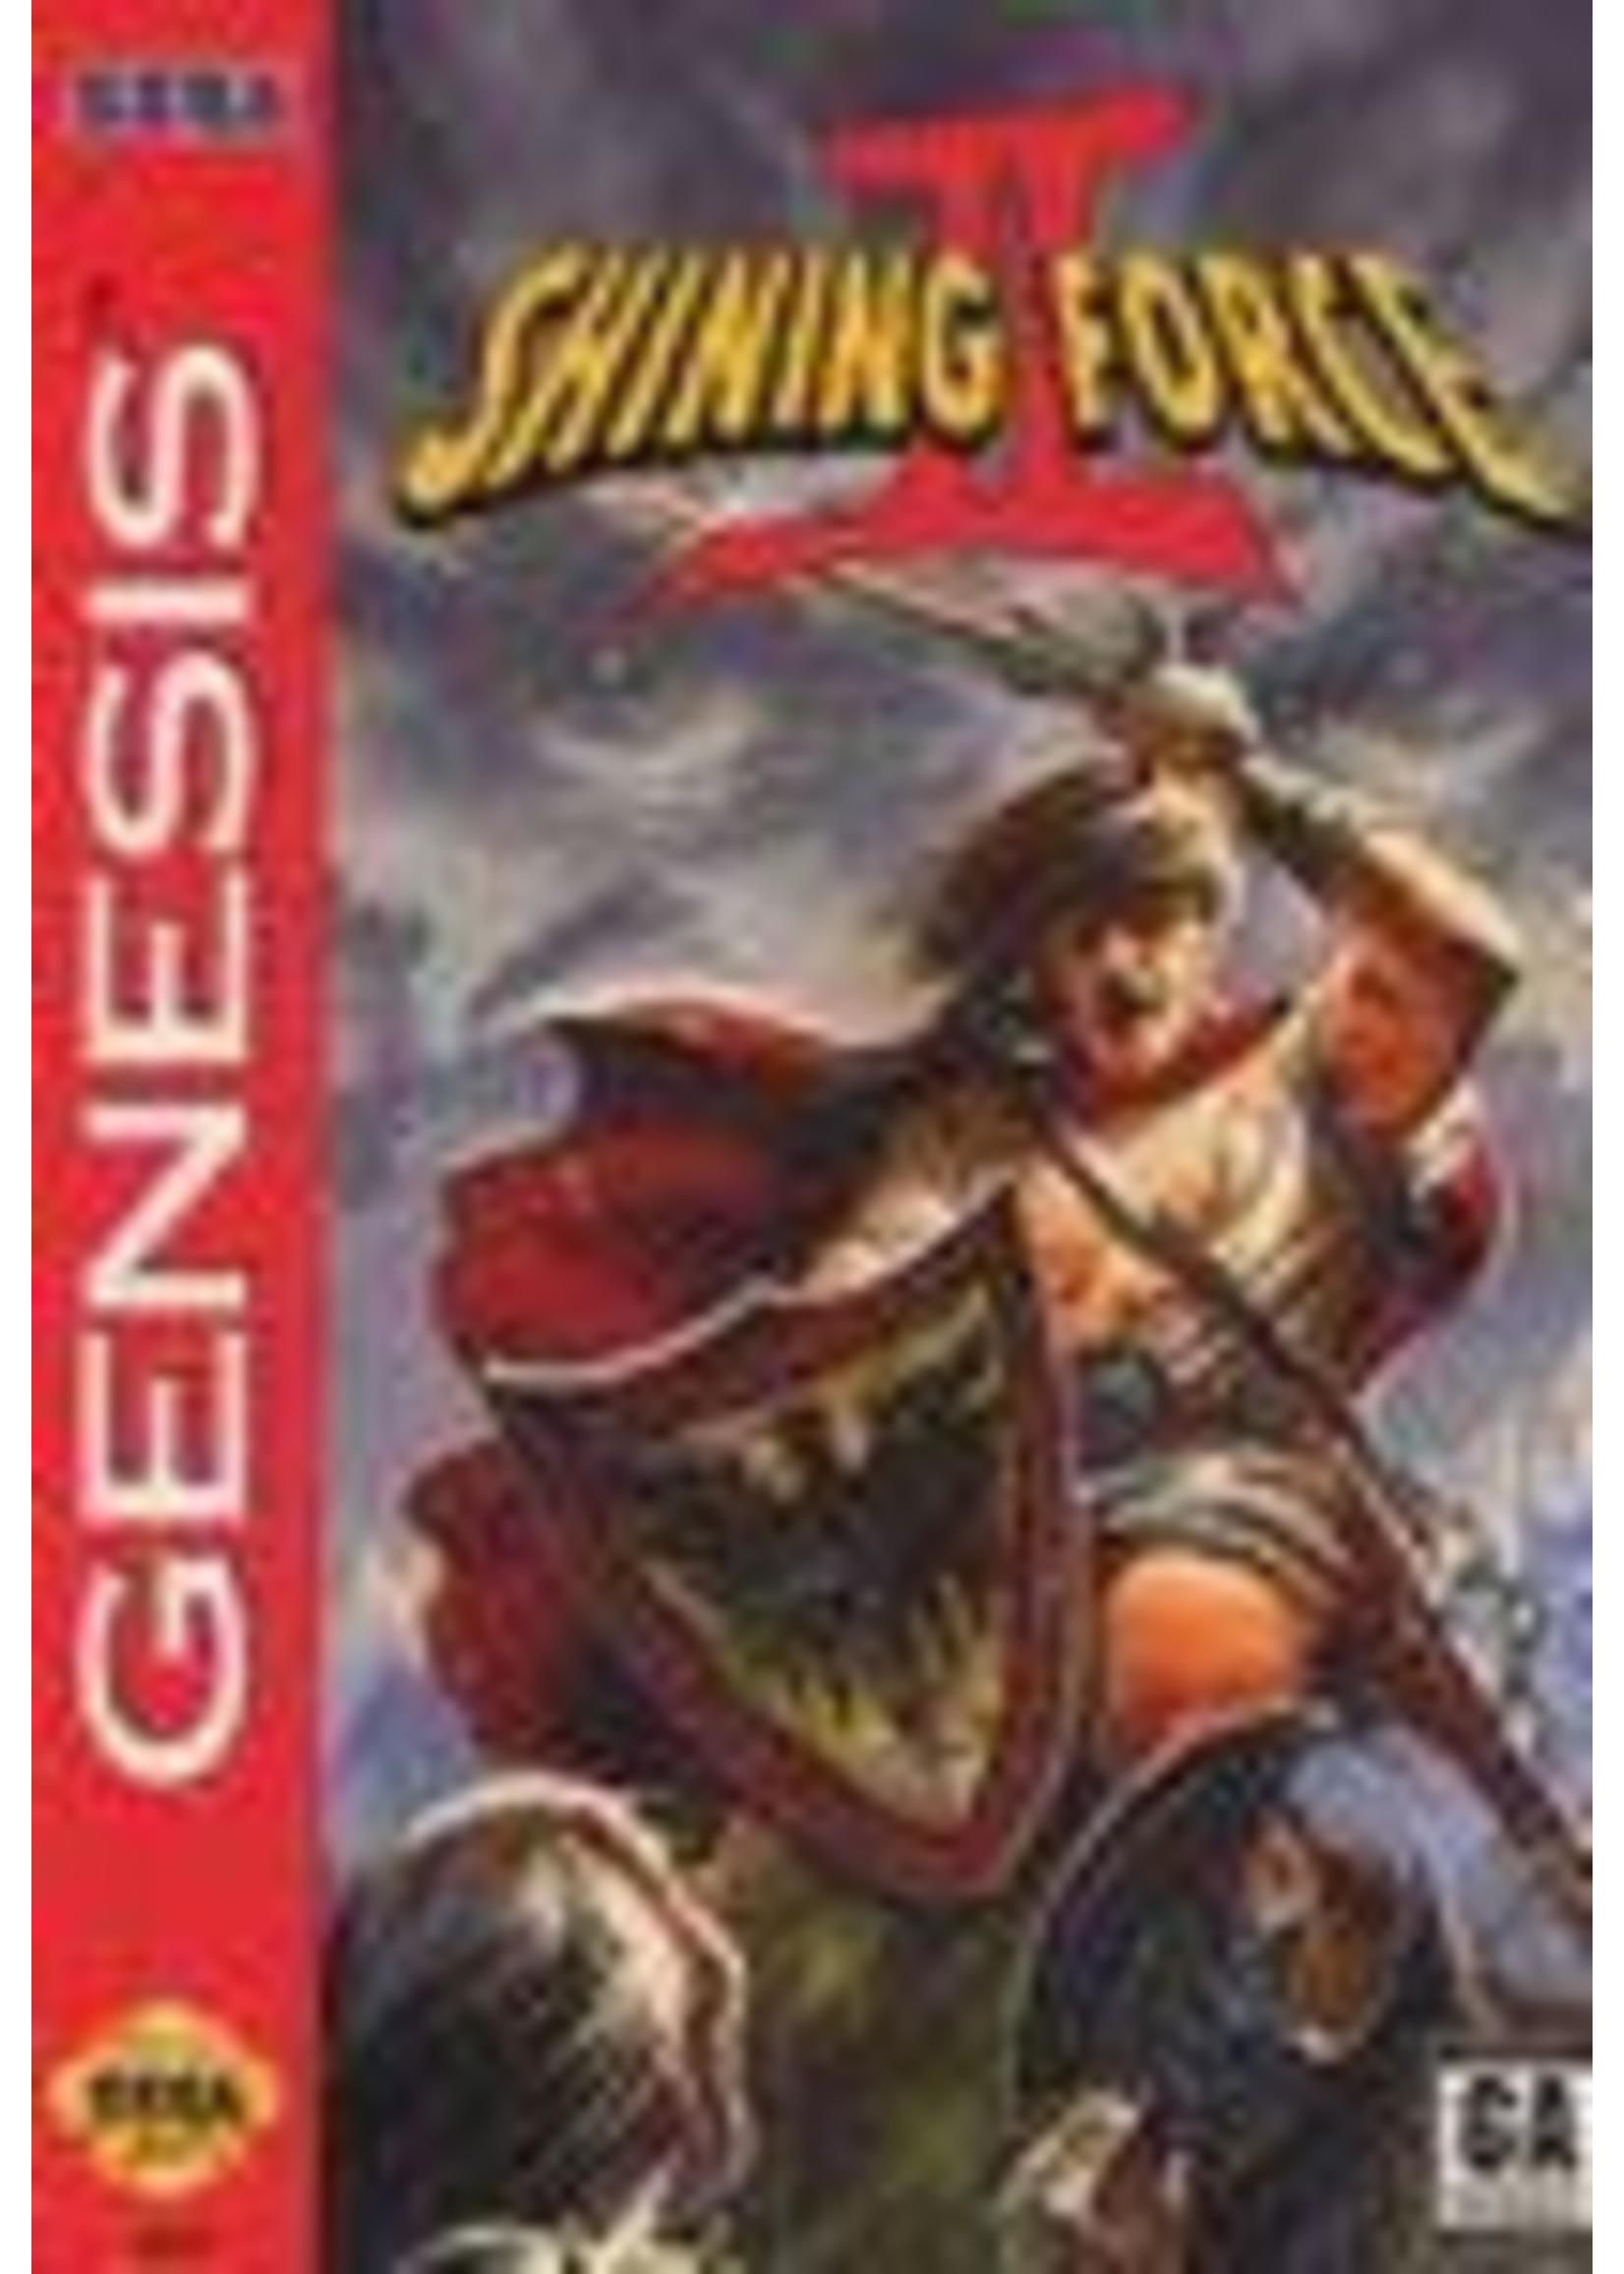 Shining Force II Sega Genesis